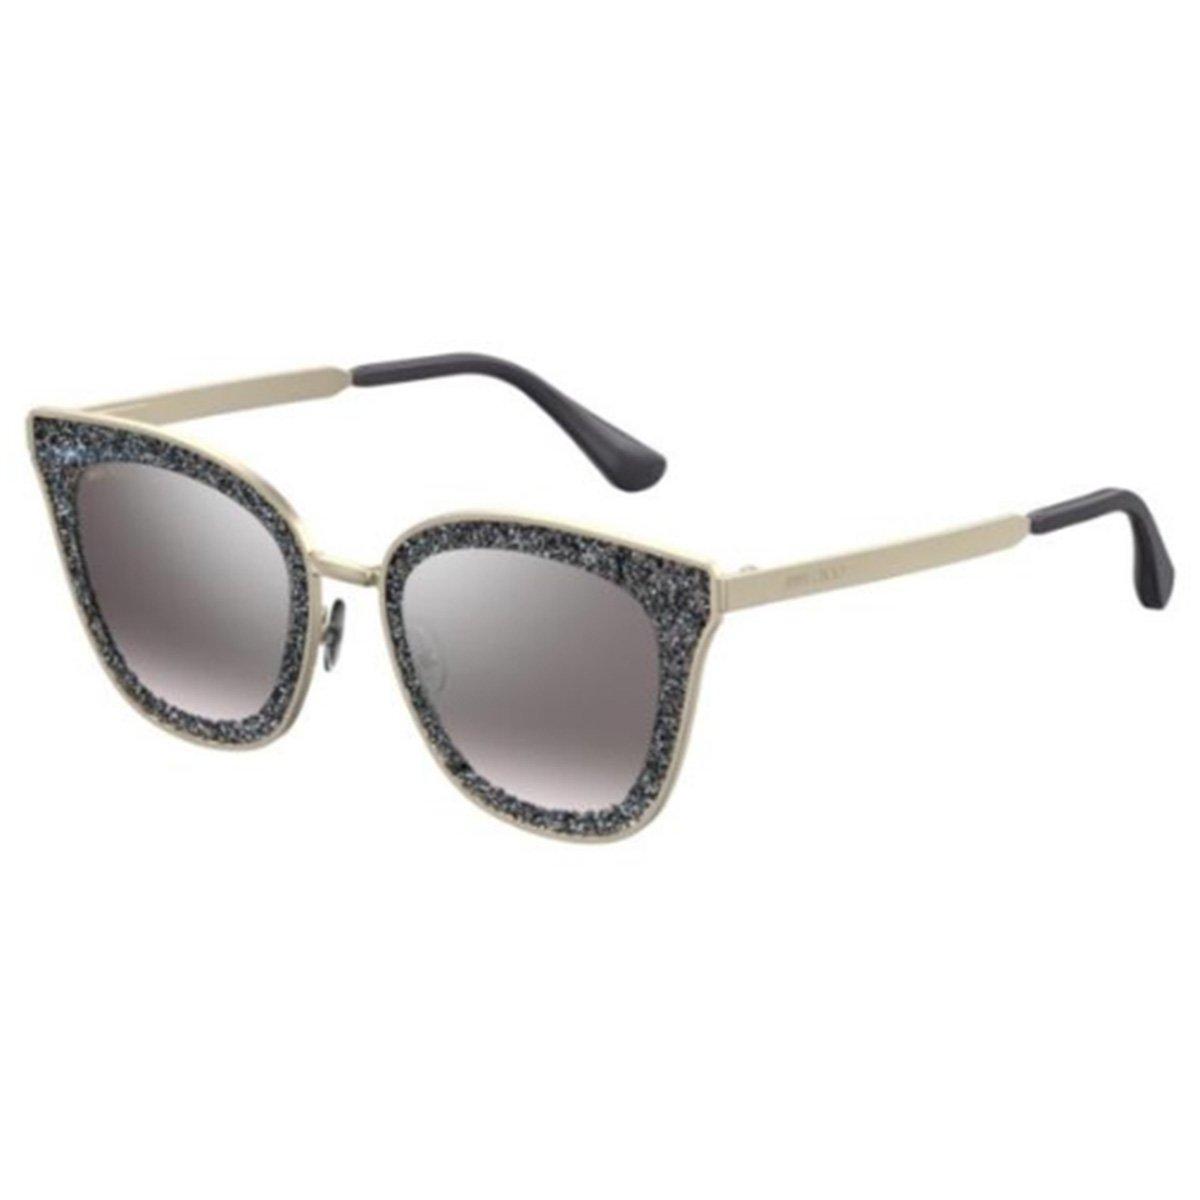 f6c8cbdffa256 Compre Óculos de Sol Jimmy Choo Lizzy s em 10X   Tri-Jóia Shop